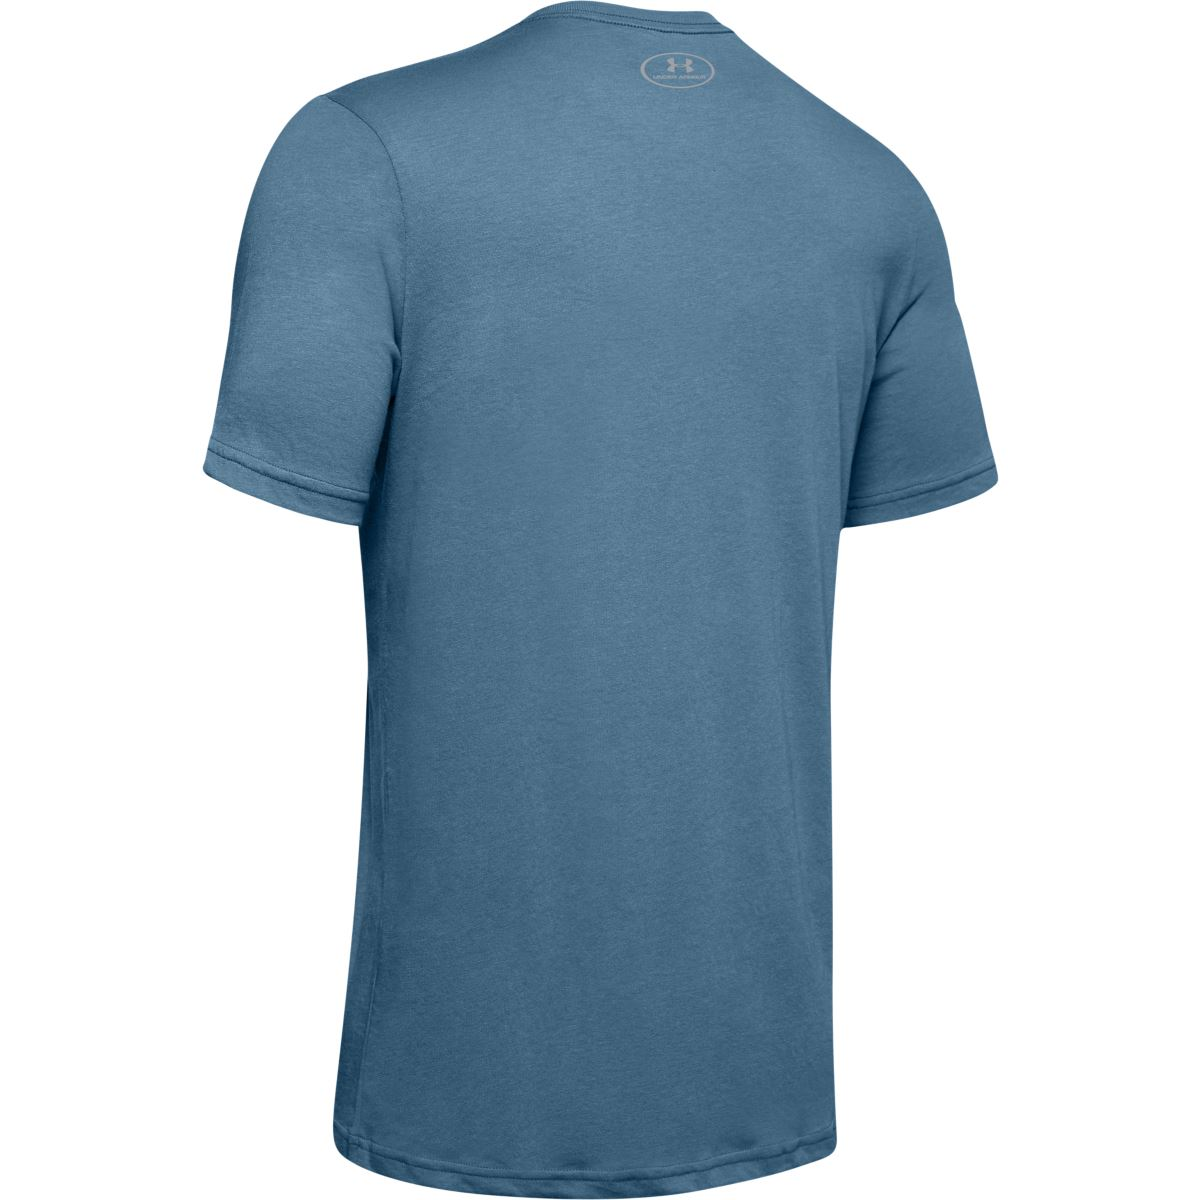 Under-Armour-Tee-2019-Mens-HeatGear-GL-Foundation-HeatGear-T-Shirt-Top thumbnail 17